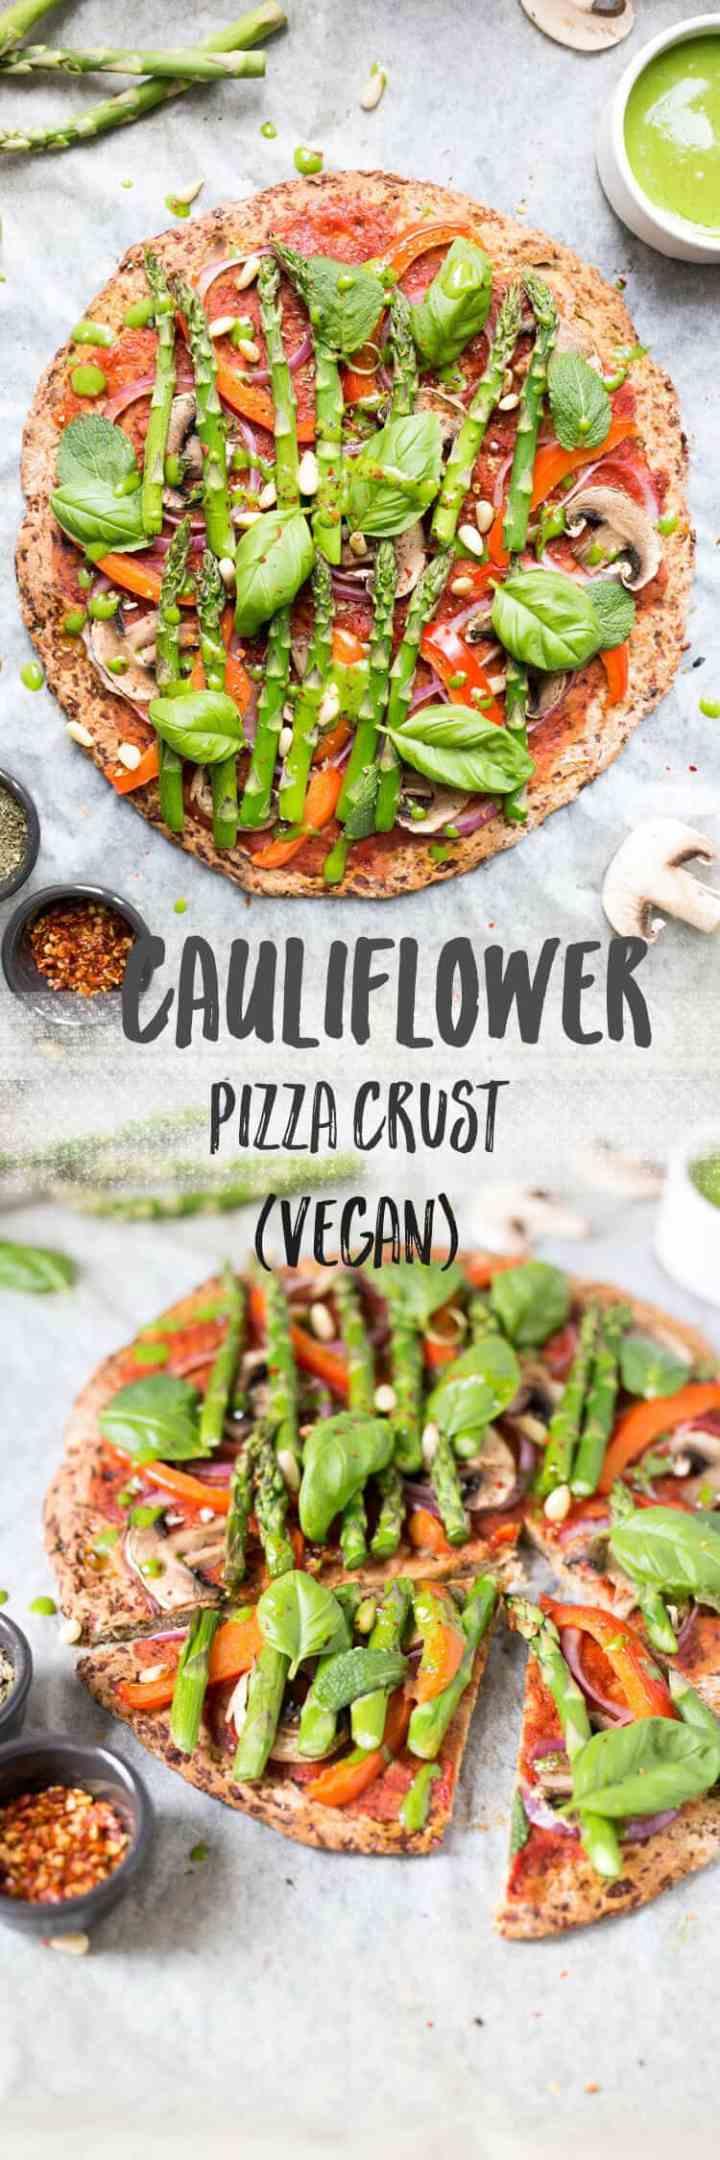 Easy cauliflower pizza crust with spinach dressing | via @annabanana.co